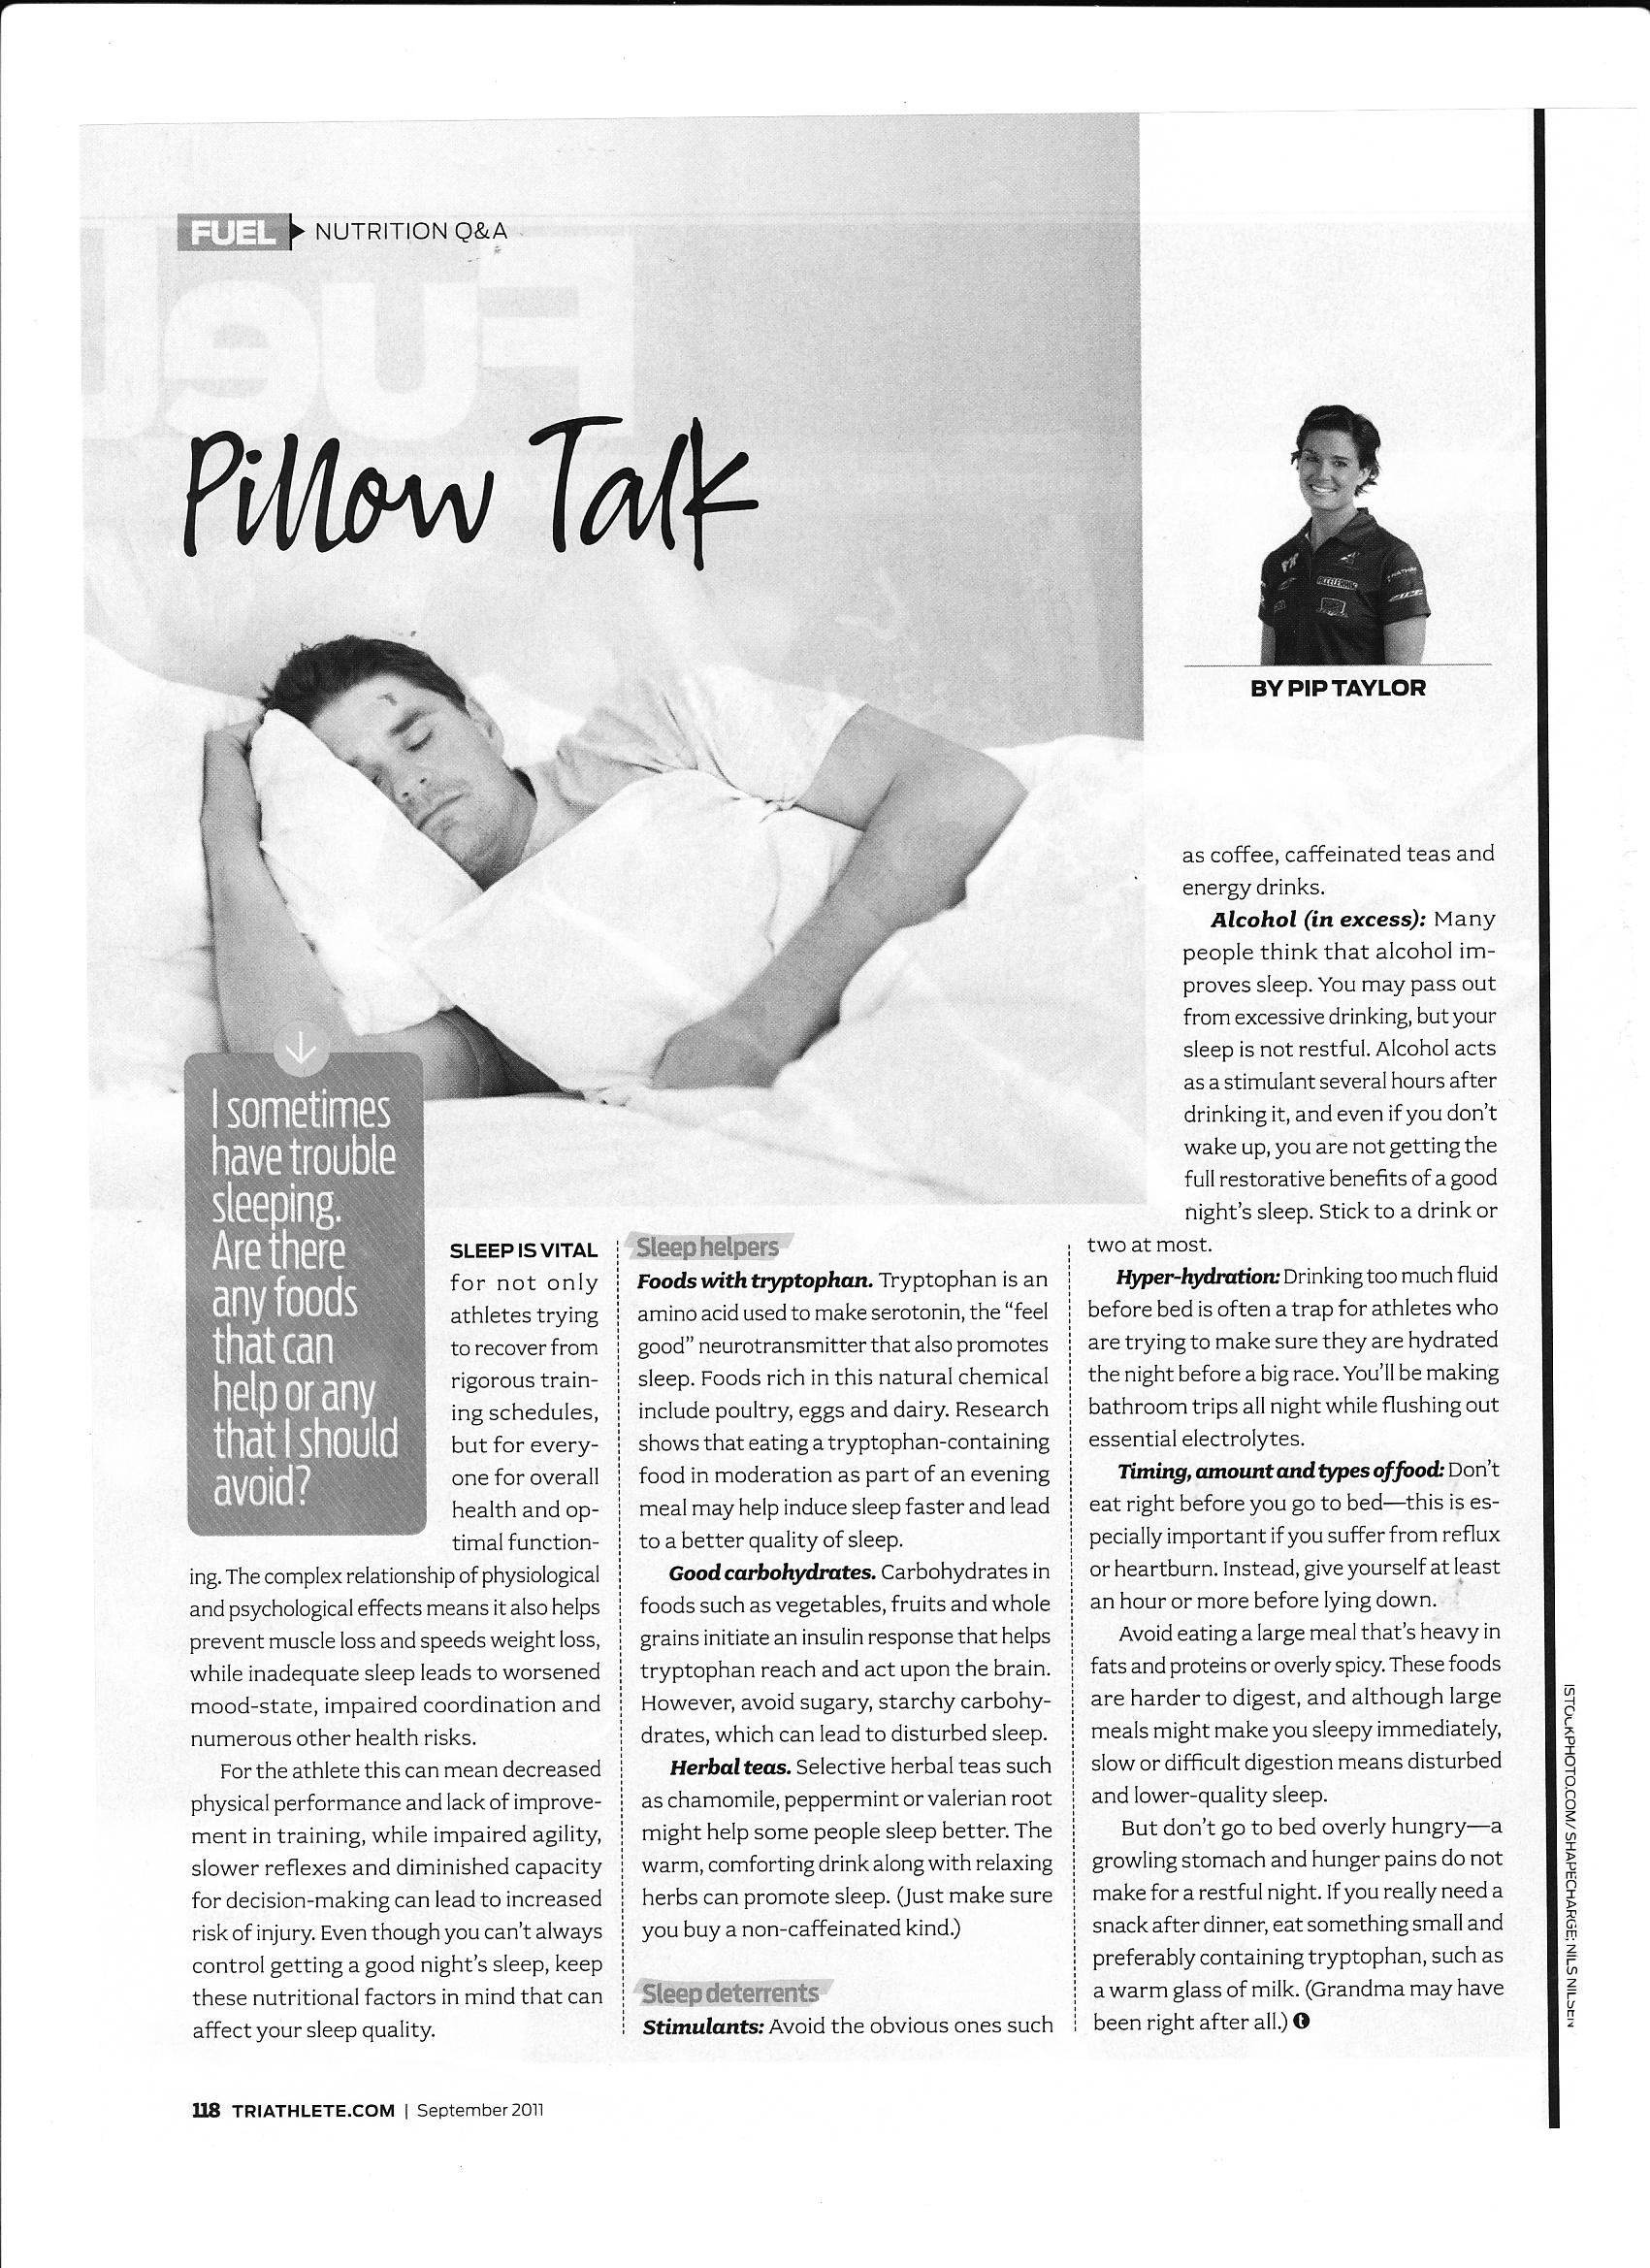 Sleep and Training